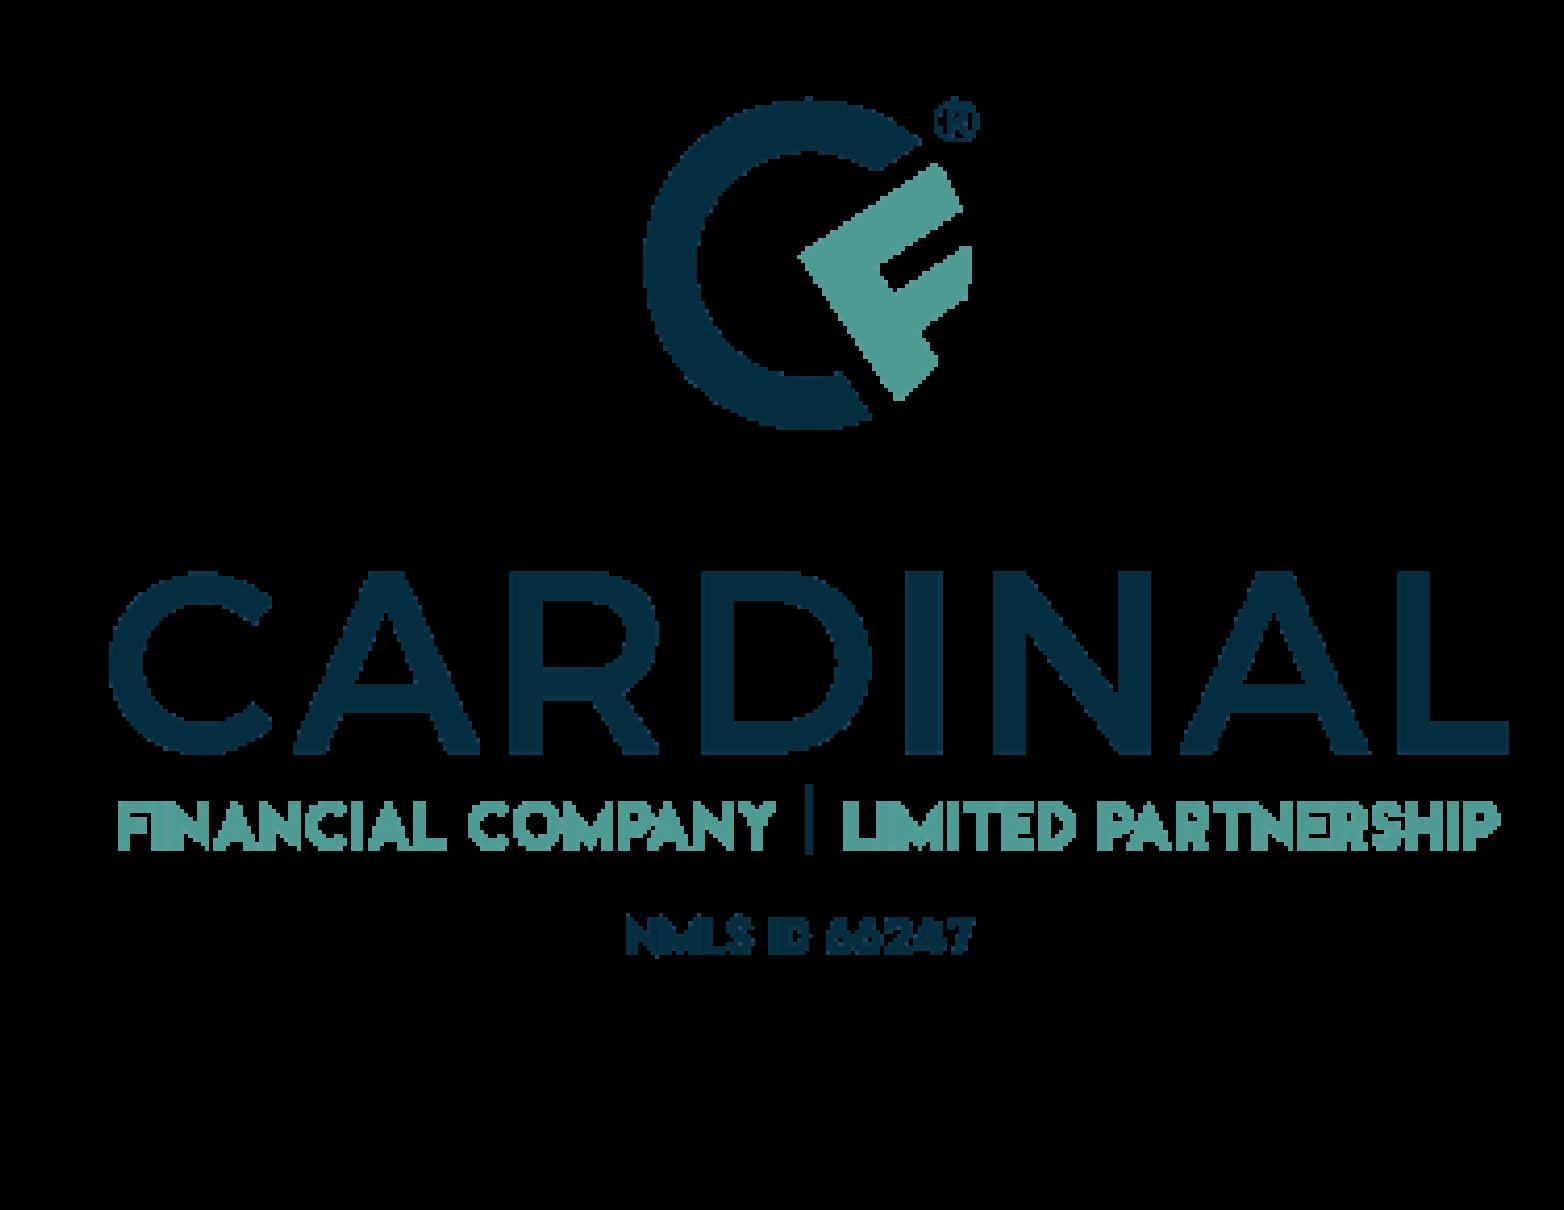 Cardinal Financial Company Limited Partnership 719-322-2897